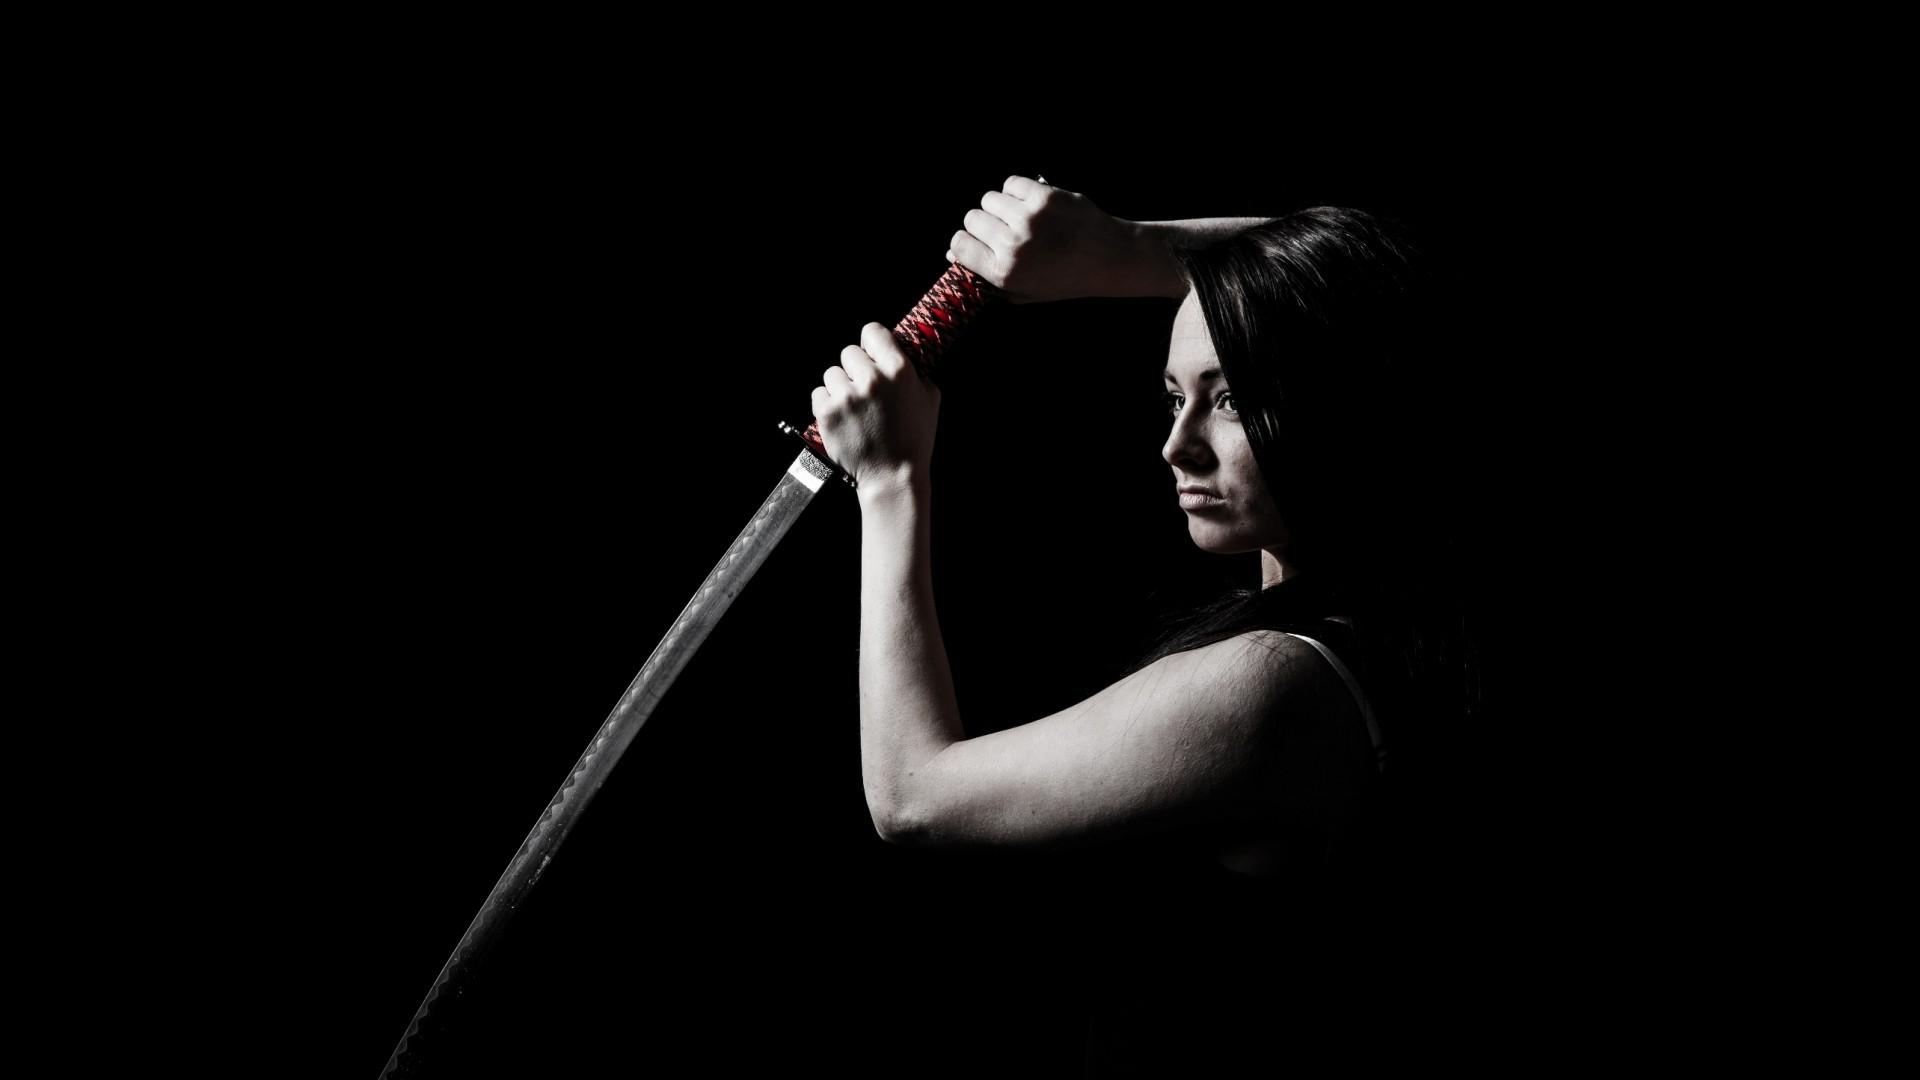 1920x1080 Wallpaper sword, katana, girl, dark 1920x1080